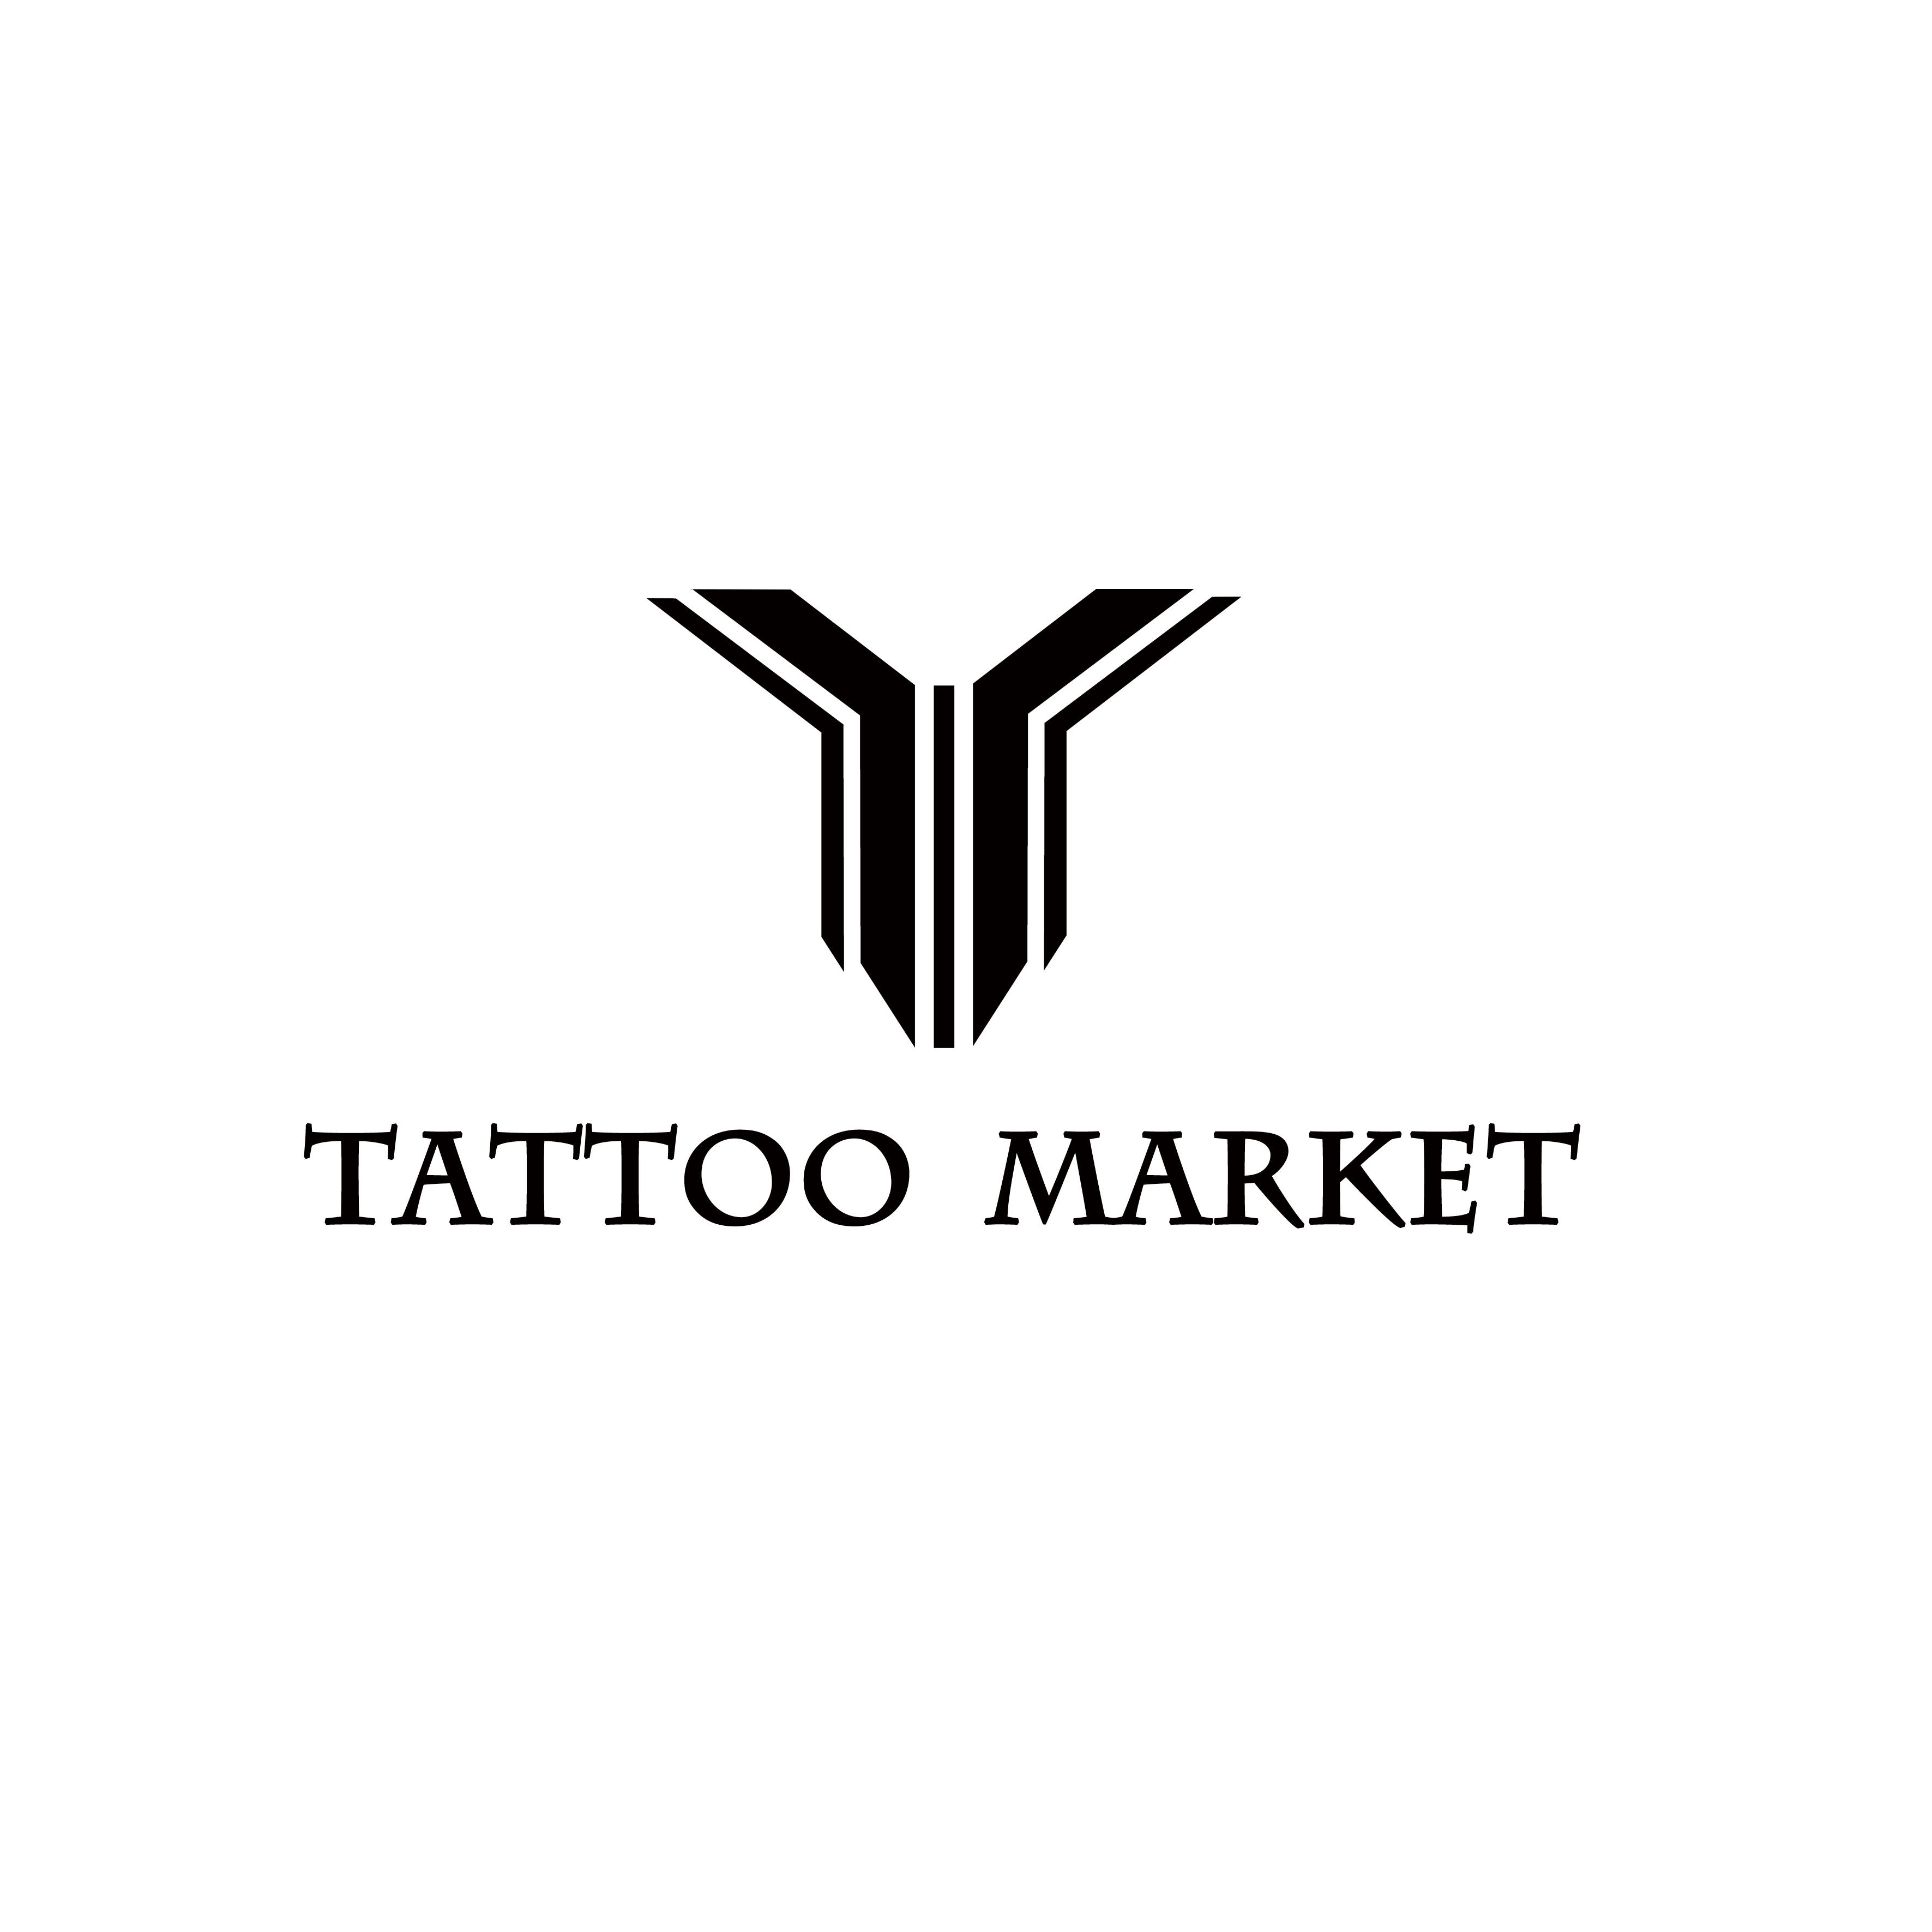 Редизайн логотипа магазина тату оборудования TattooMarket.ru фото f_3395c39cedcc509c.jpg